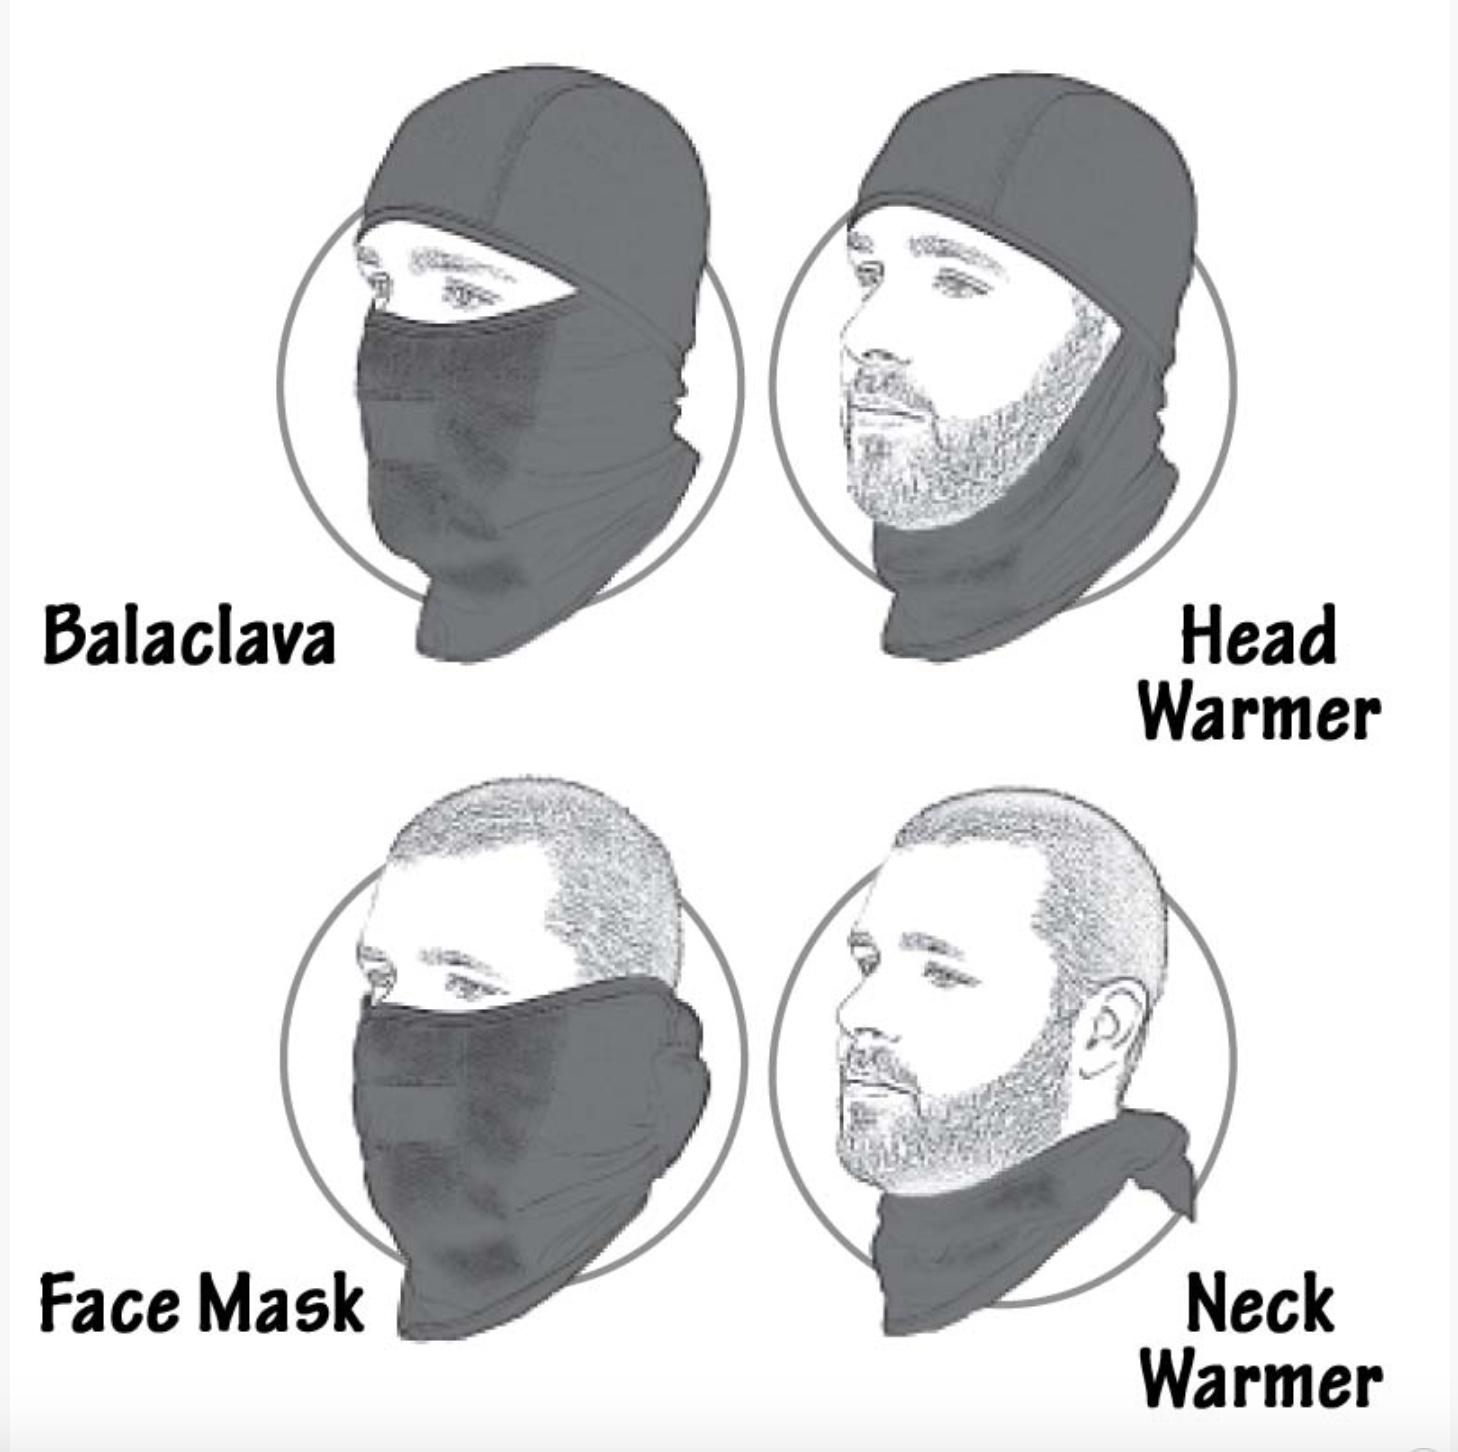 BACKWOODS 多功能巴拉克拉法帽